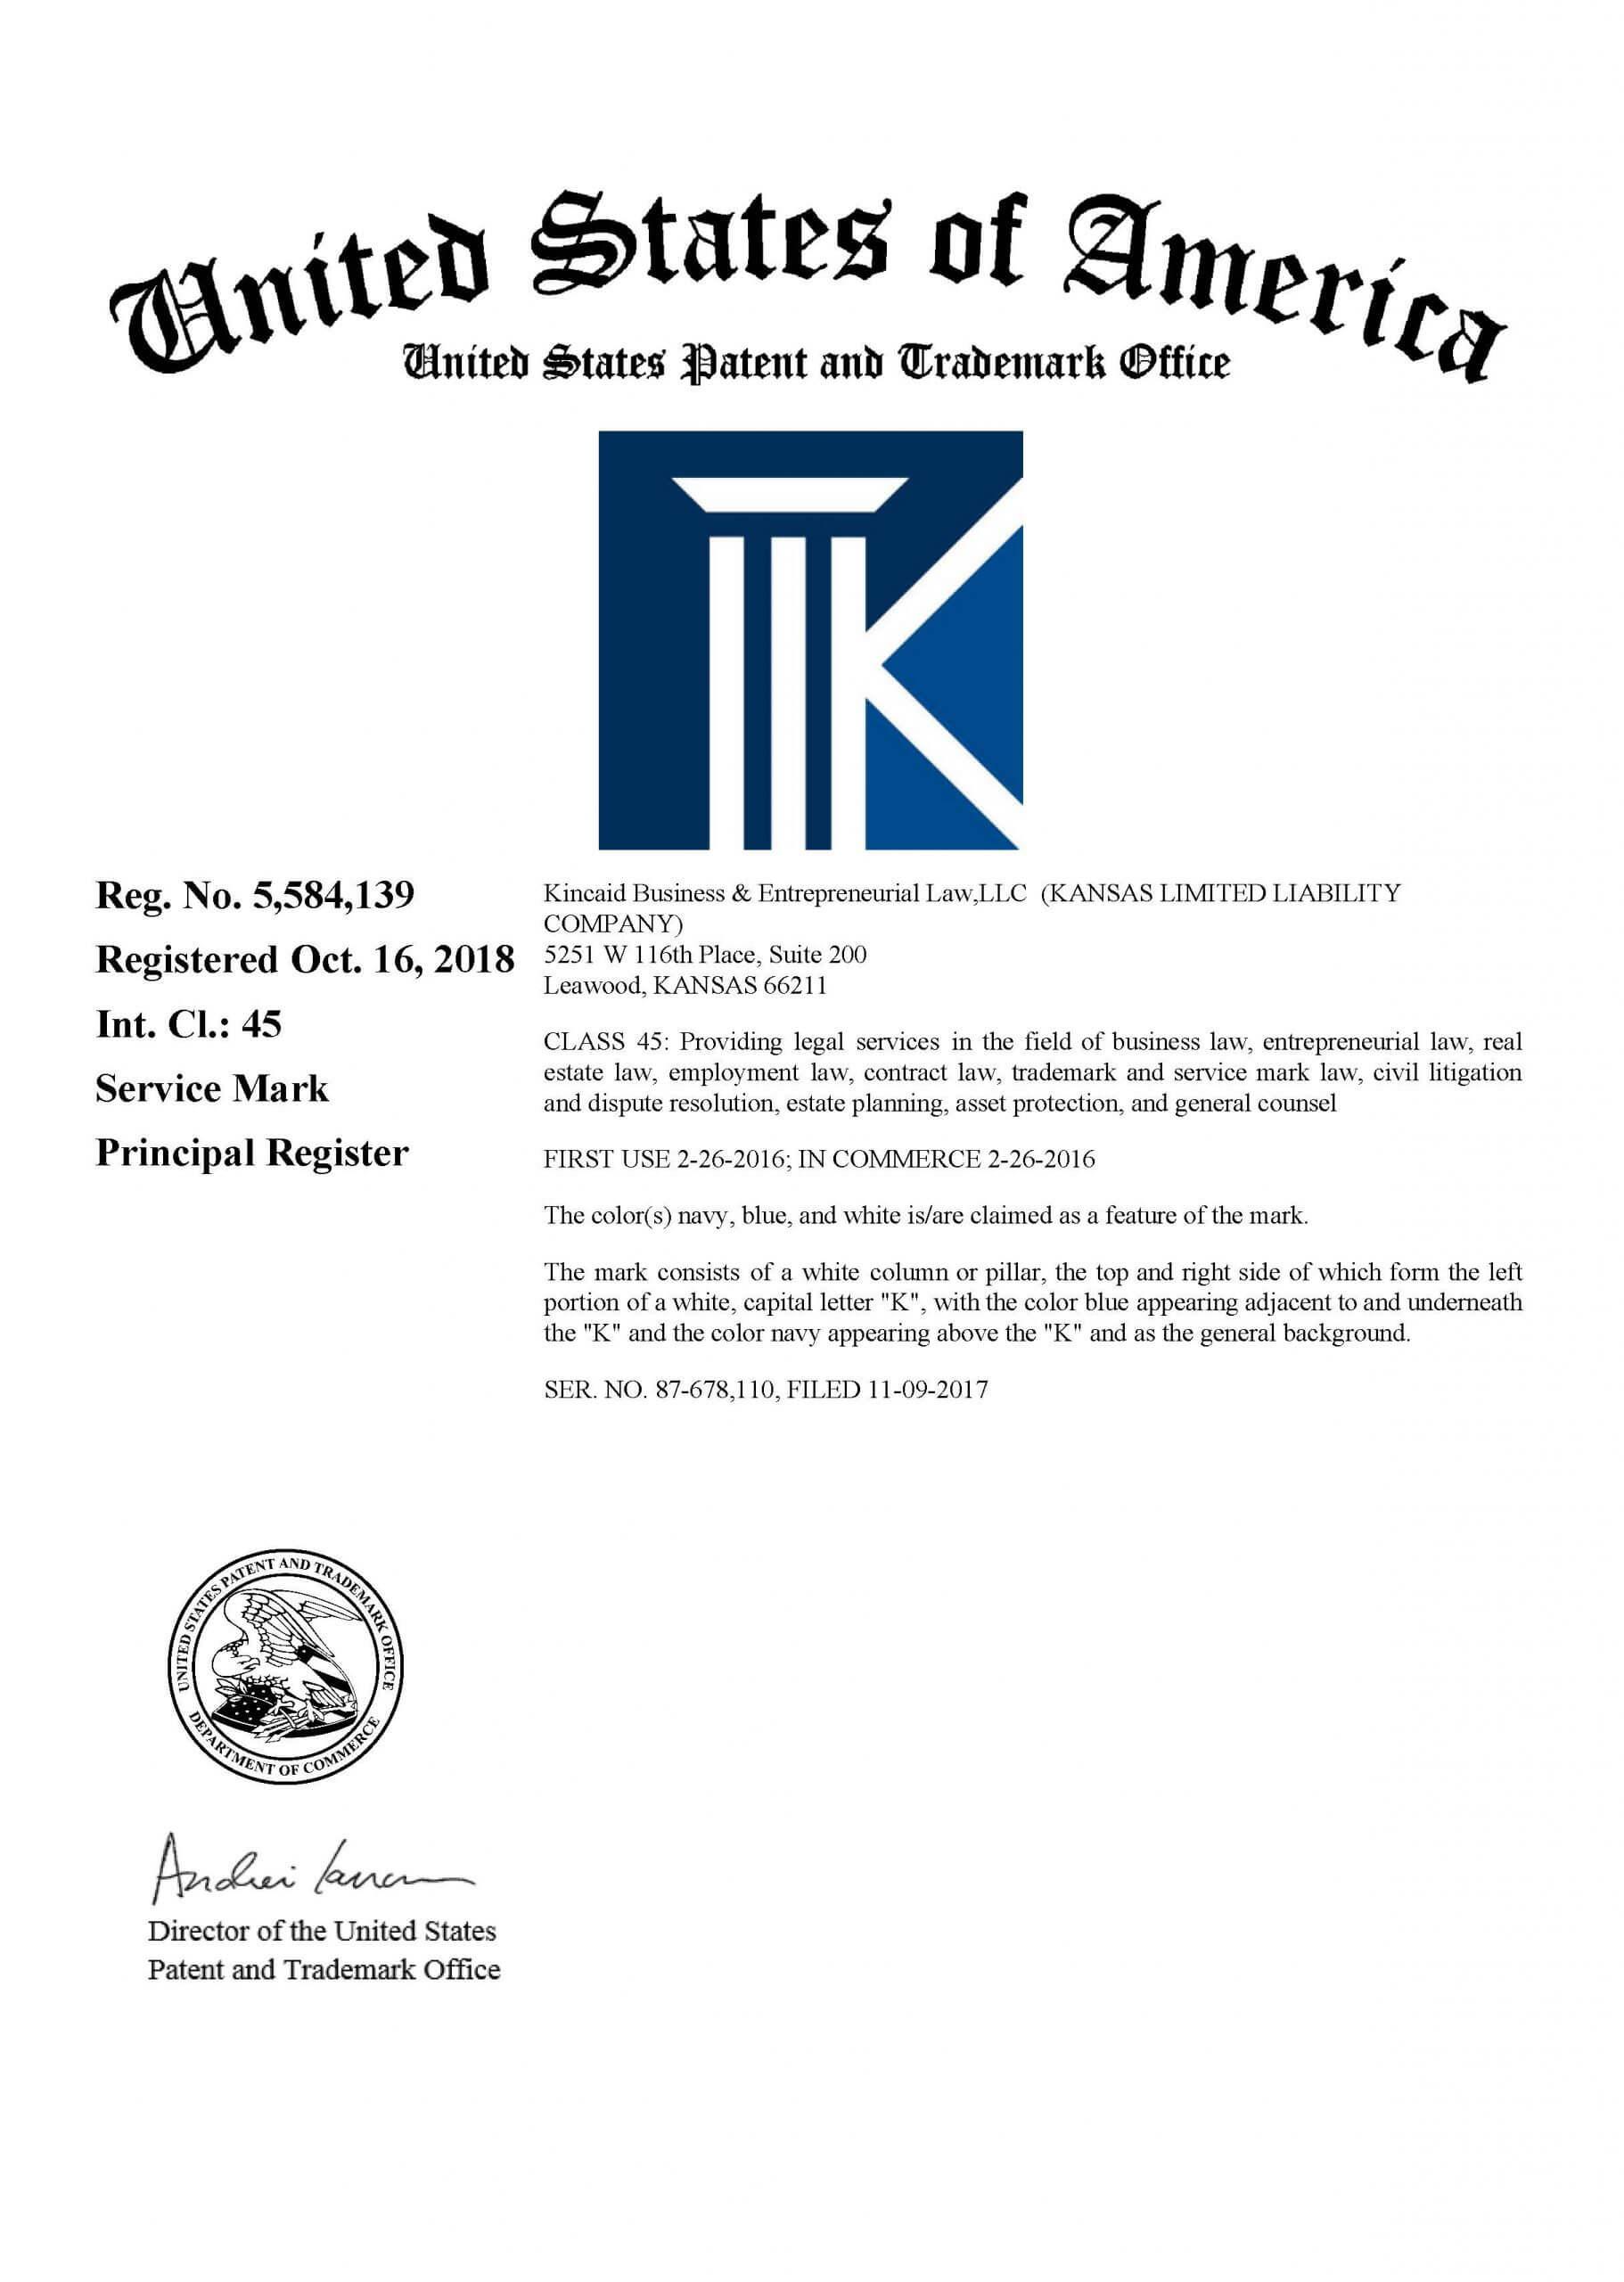 Business Logo or Design Shown on Federal Trademark Registration Certificate